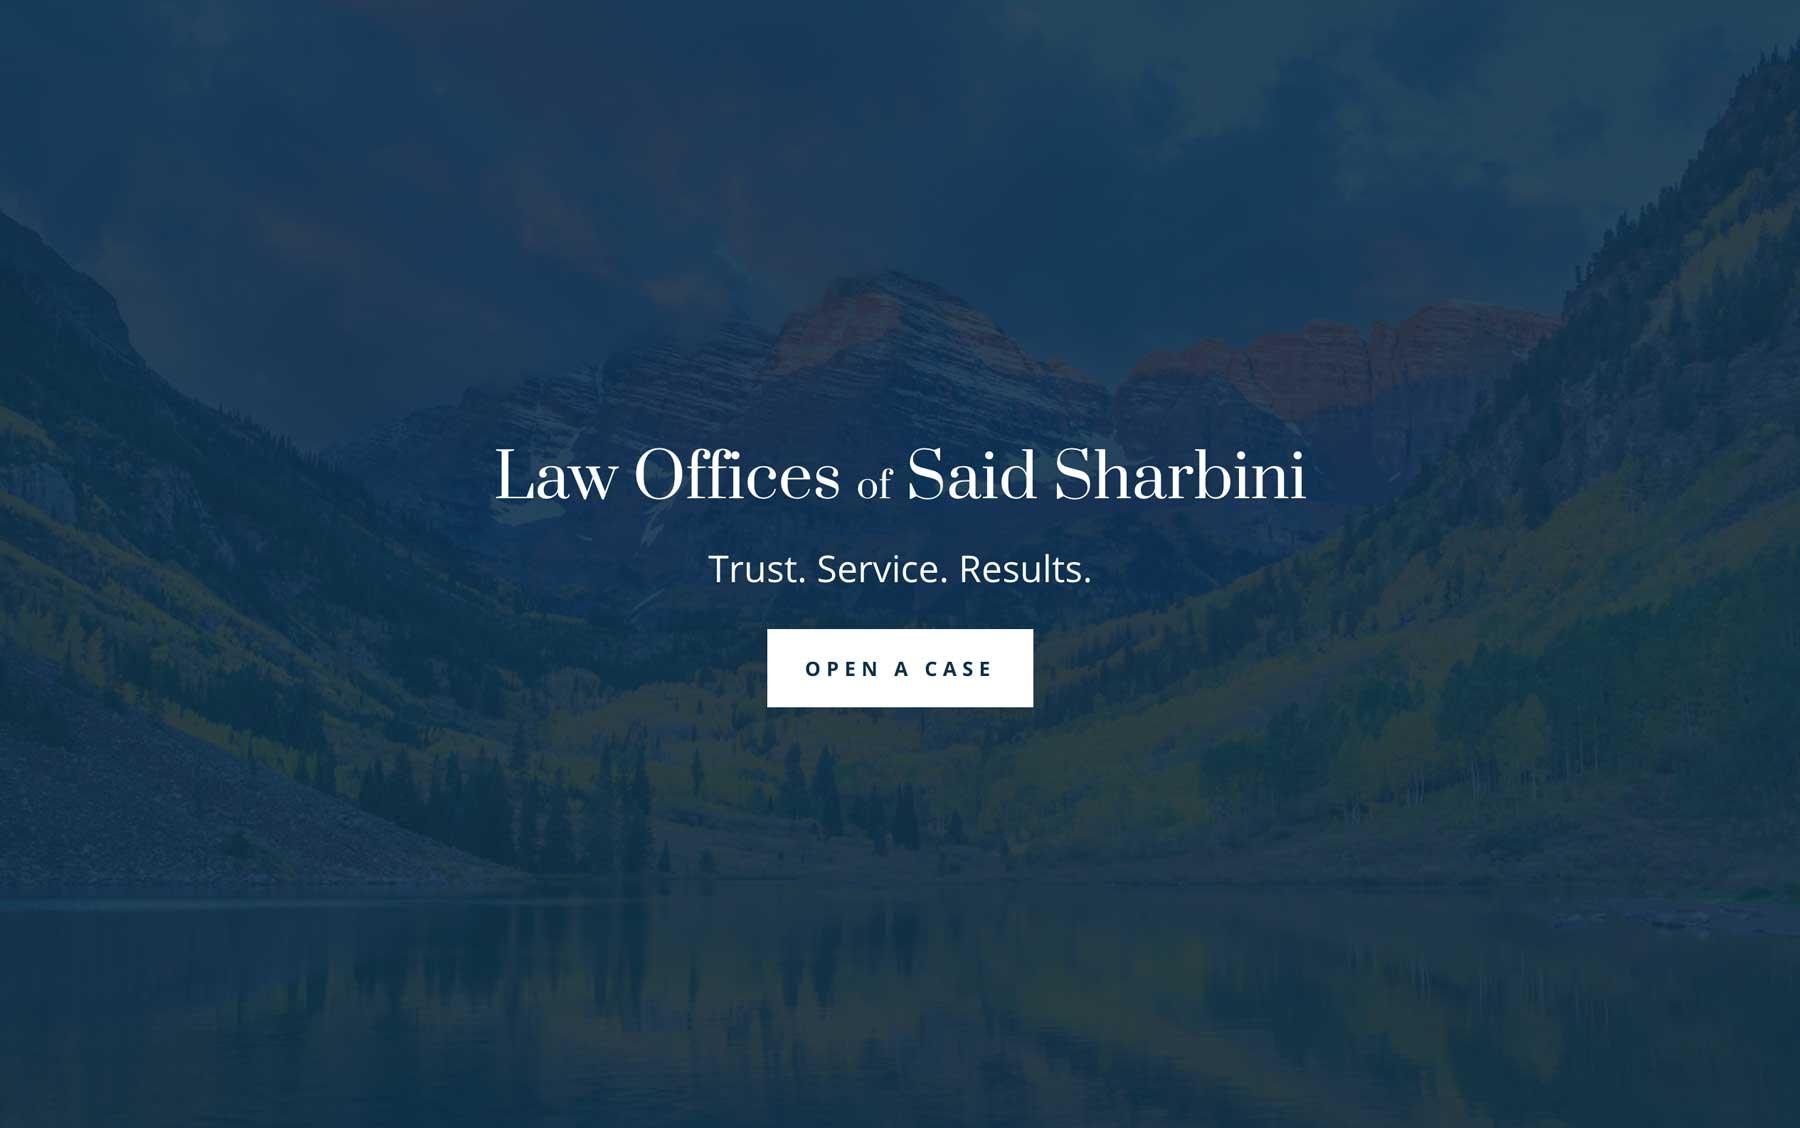 Sharbini Law